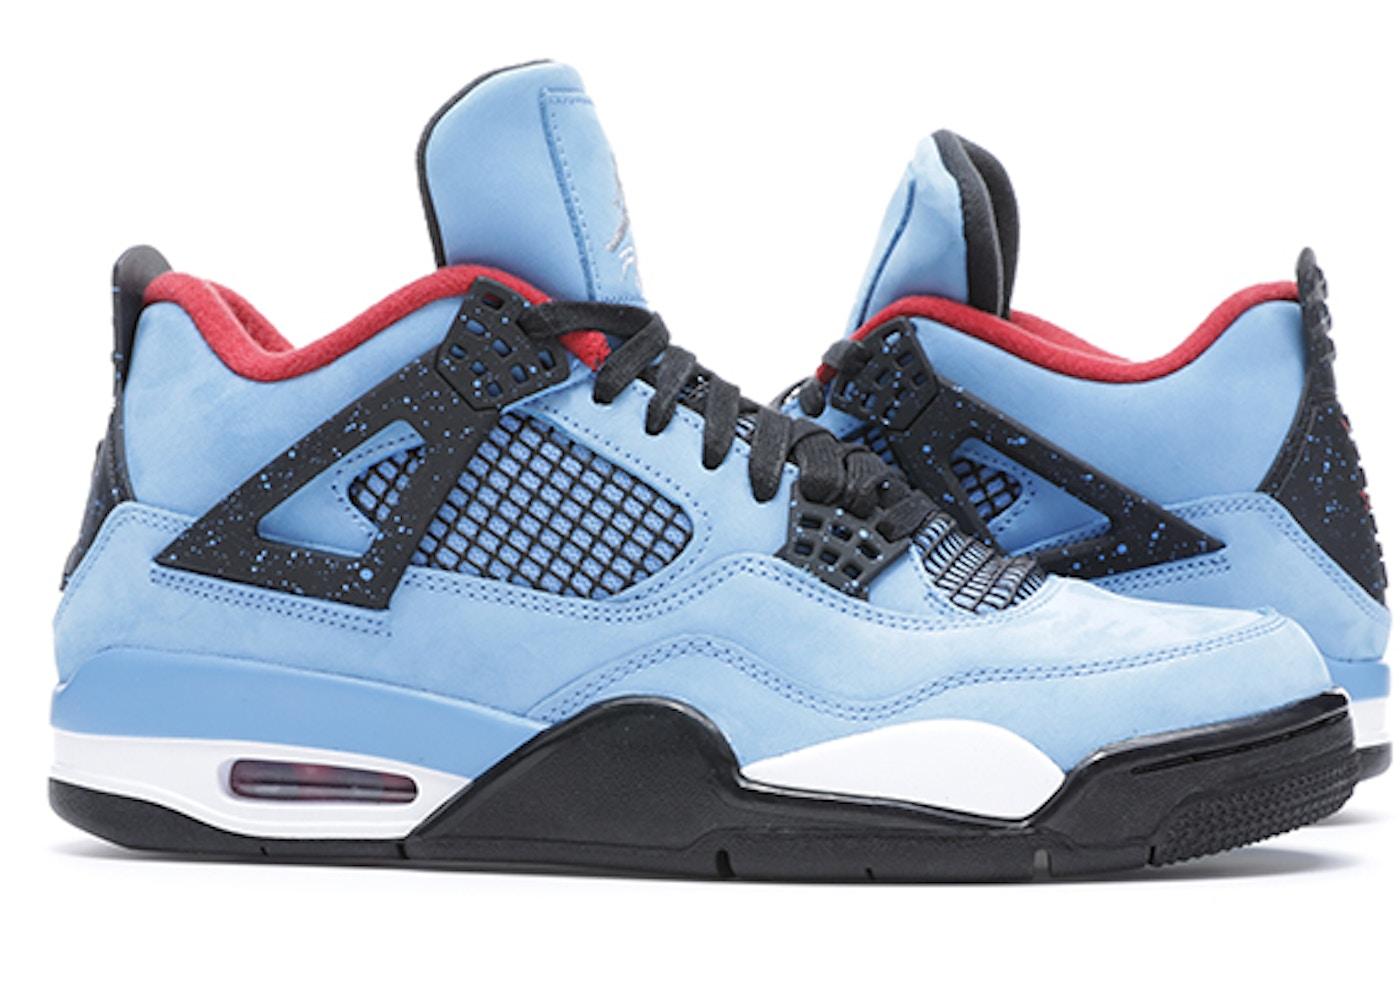 bdcf1281a9a0f4 Buy Air Jordan 4 Shoes   Deadstock Sneakers